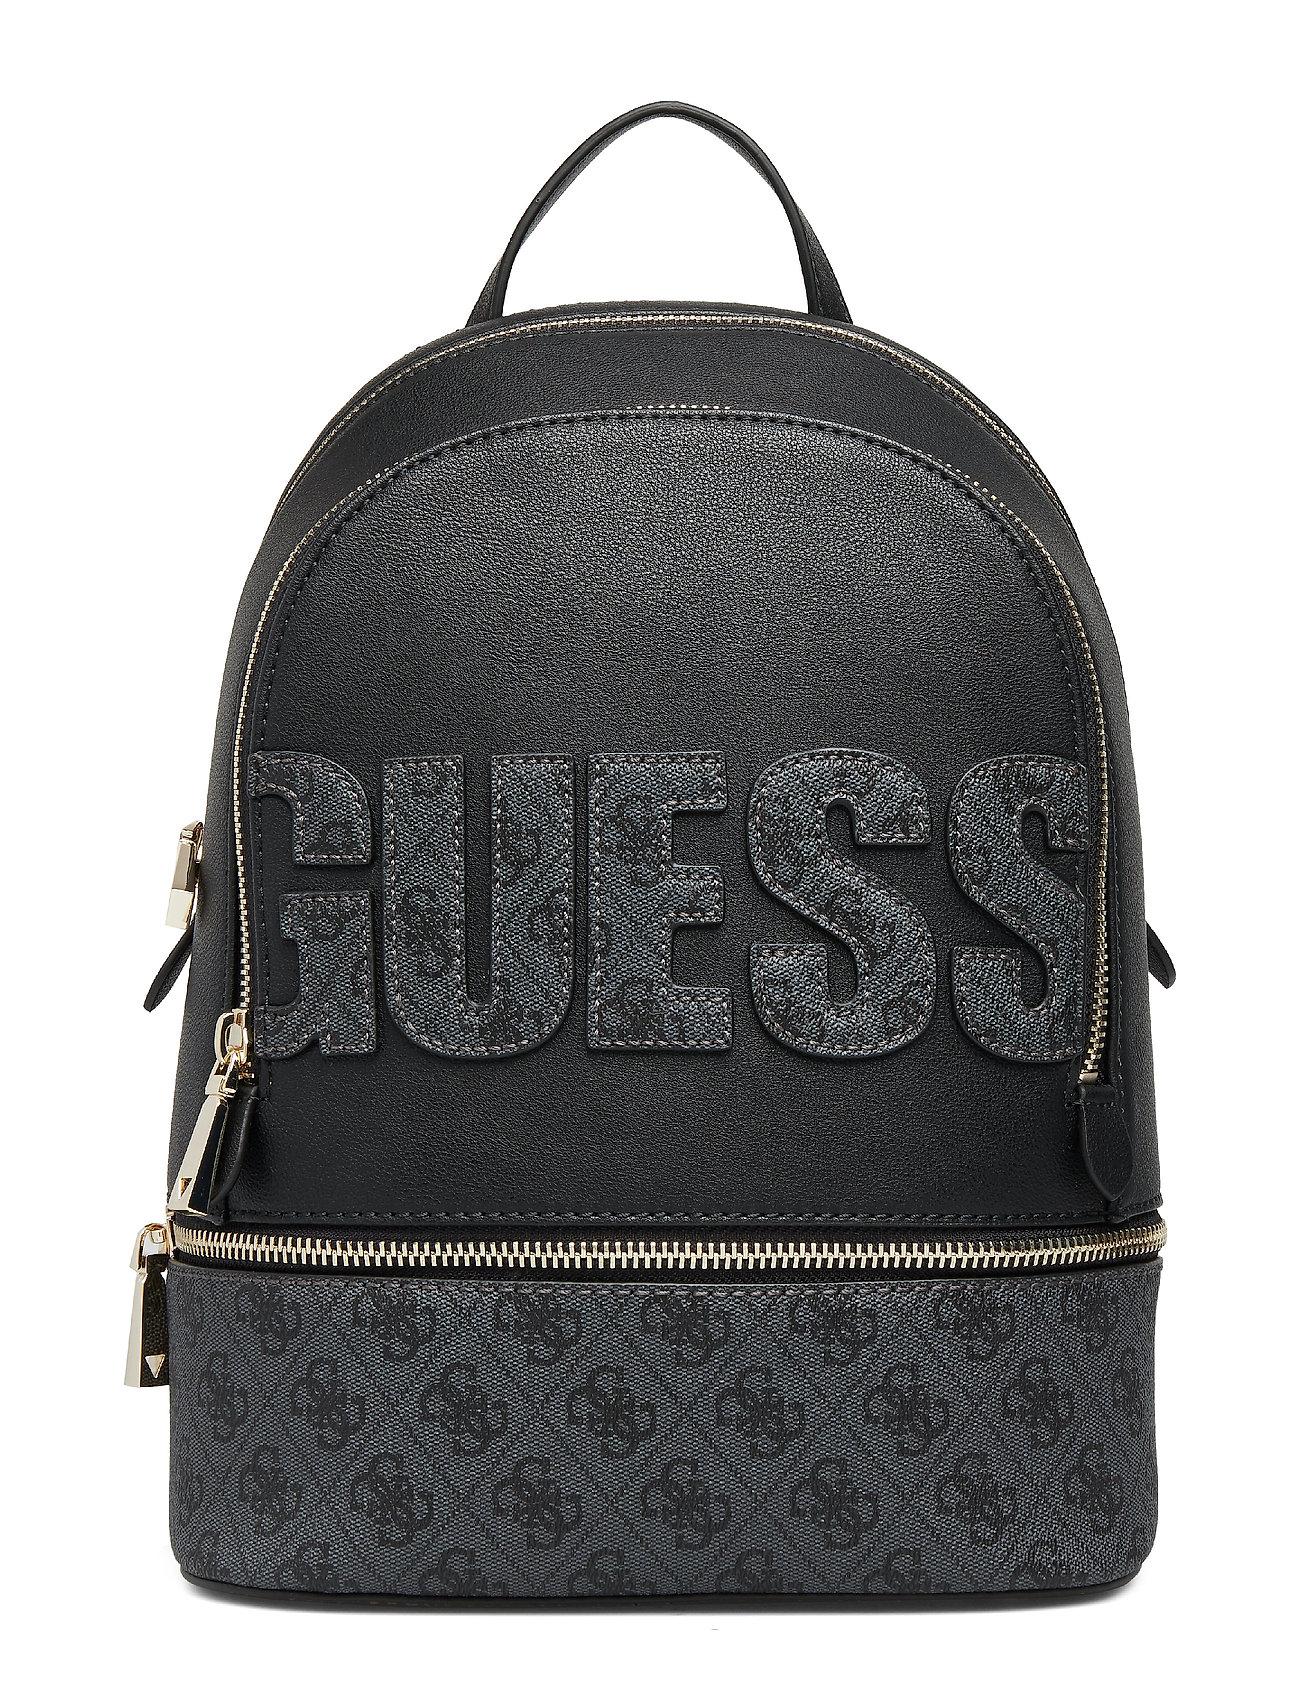 GUESS Skye Large Backpack Bags Backpacks Fashion Backpacks Schwarz GUESS